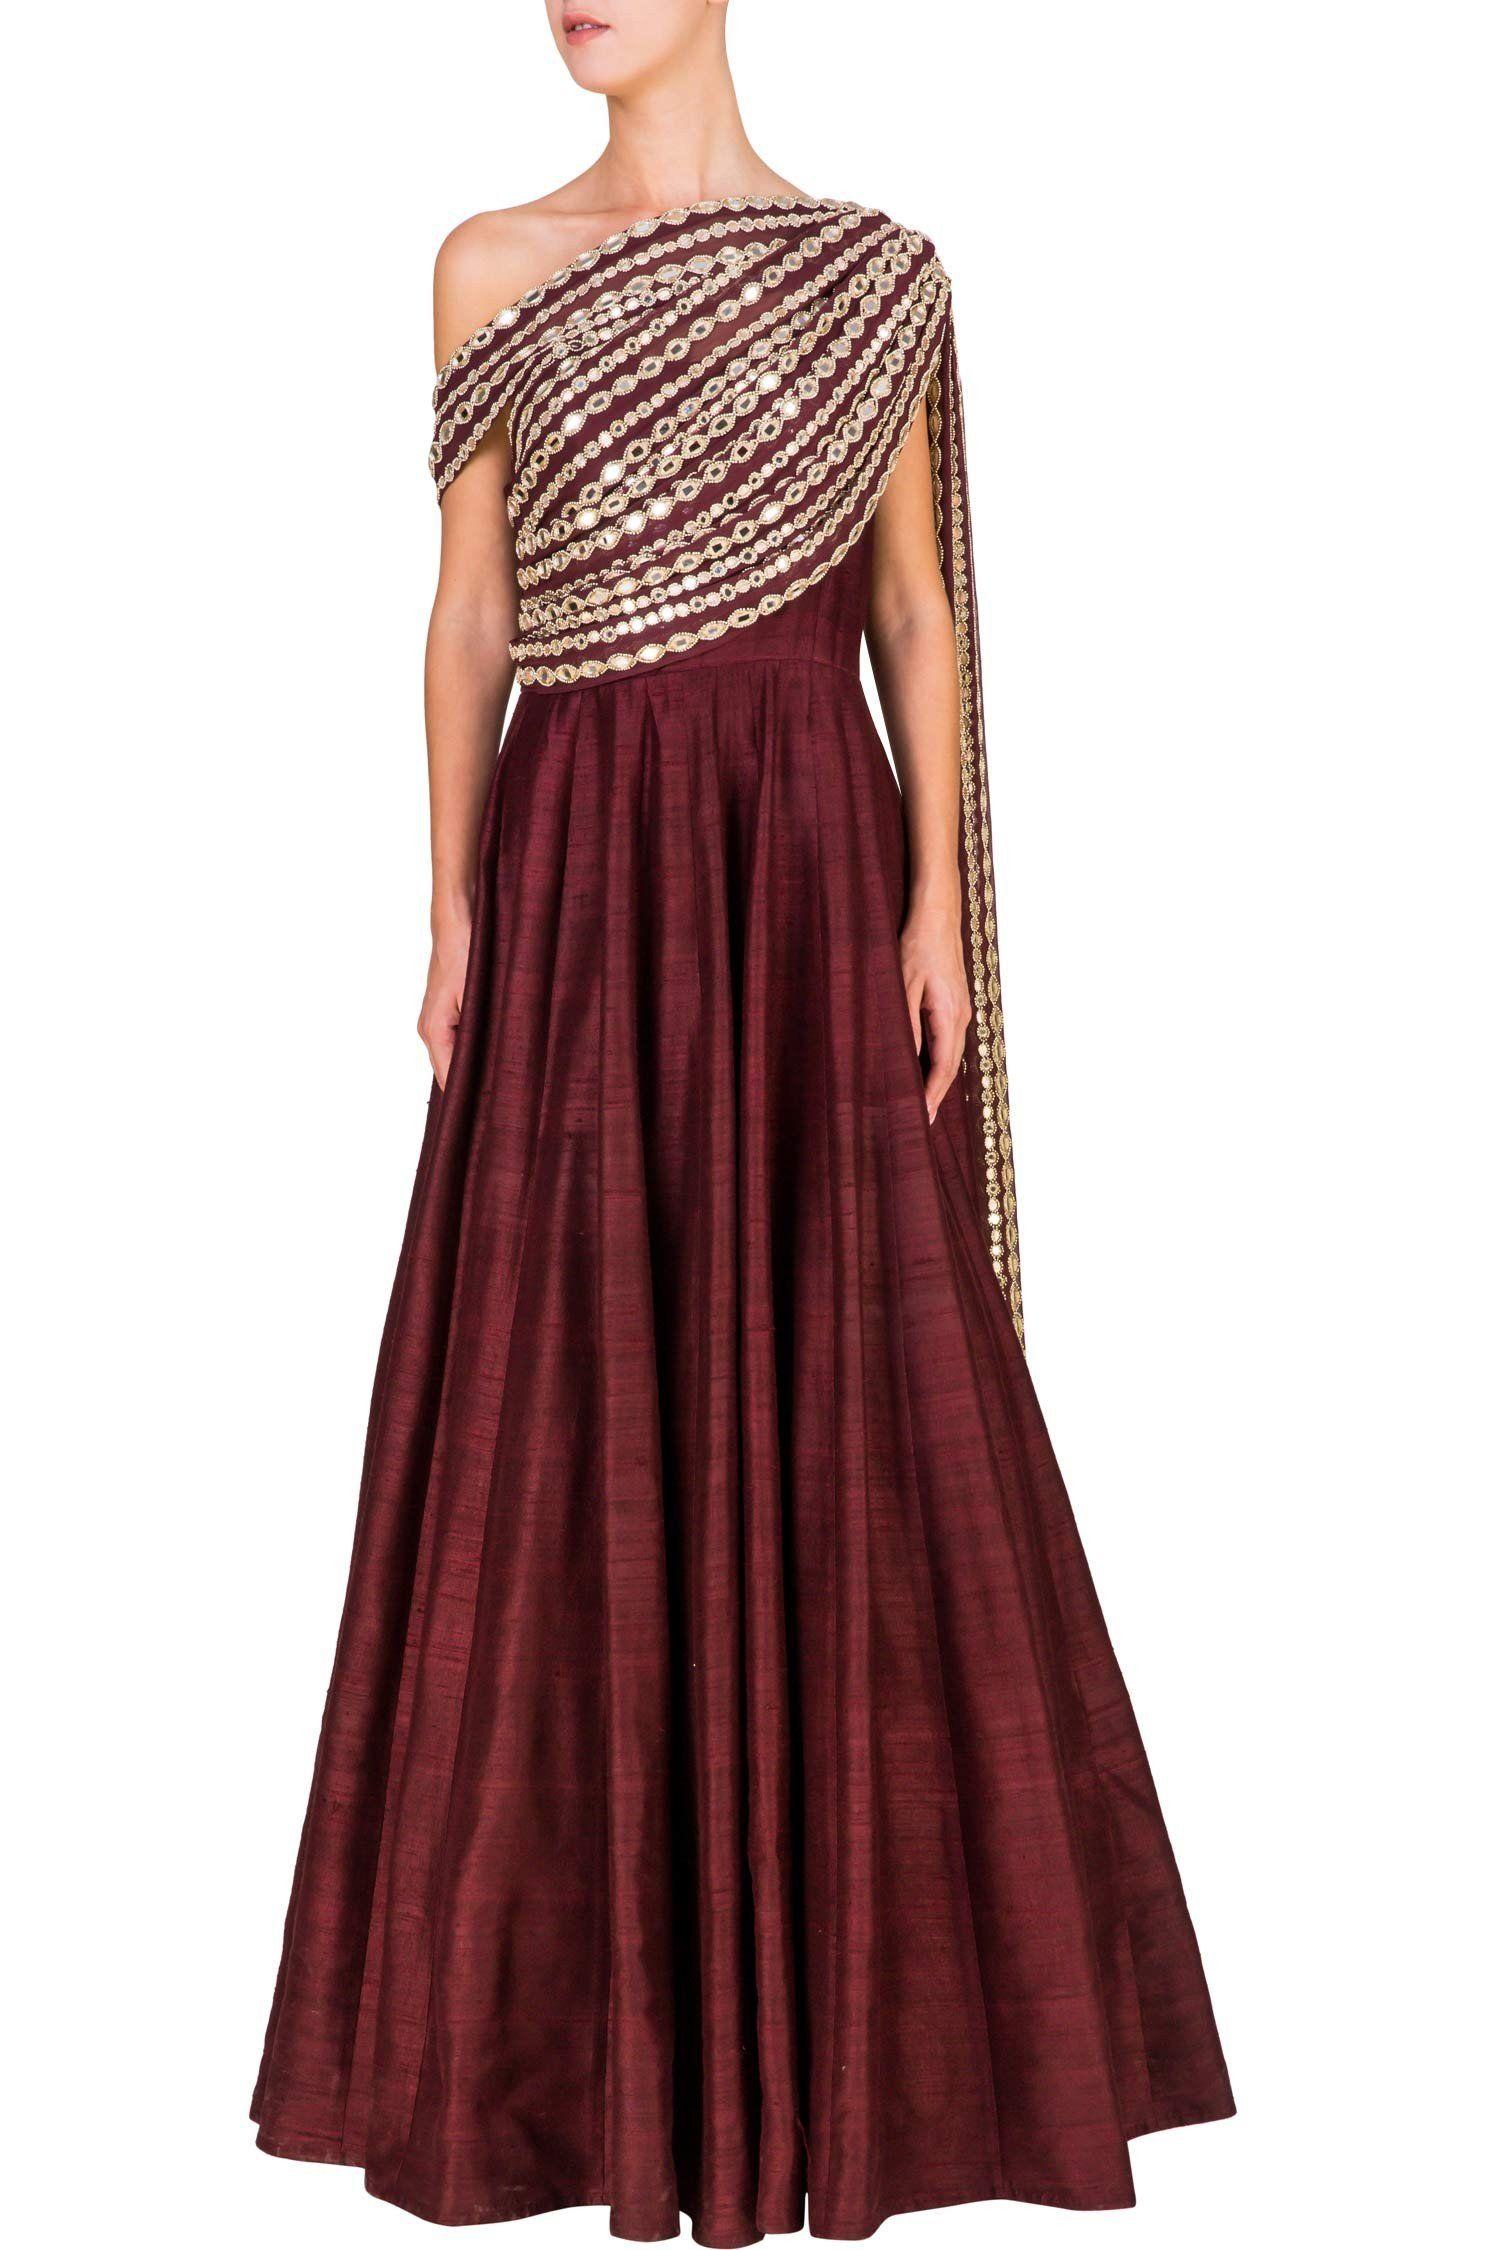 7bf4680ec08397 Off-shoulder anarkali with mirrored dupatta Saree Gown, Anarkali Dress,  Anarkali Suits,